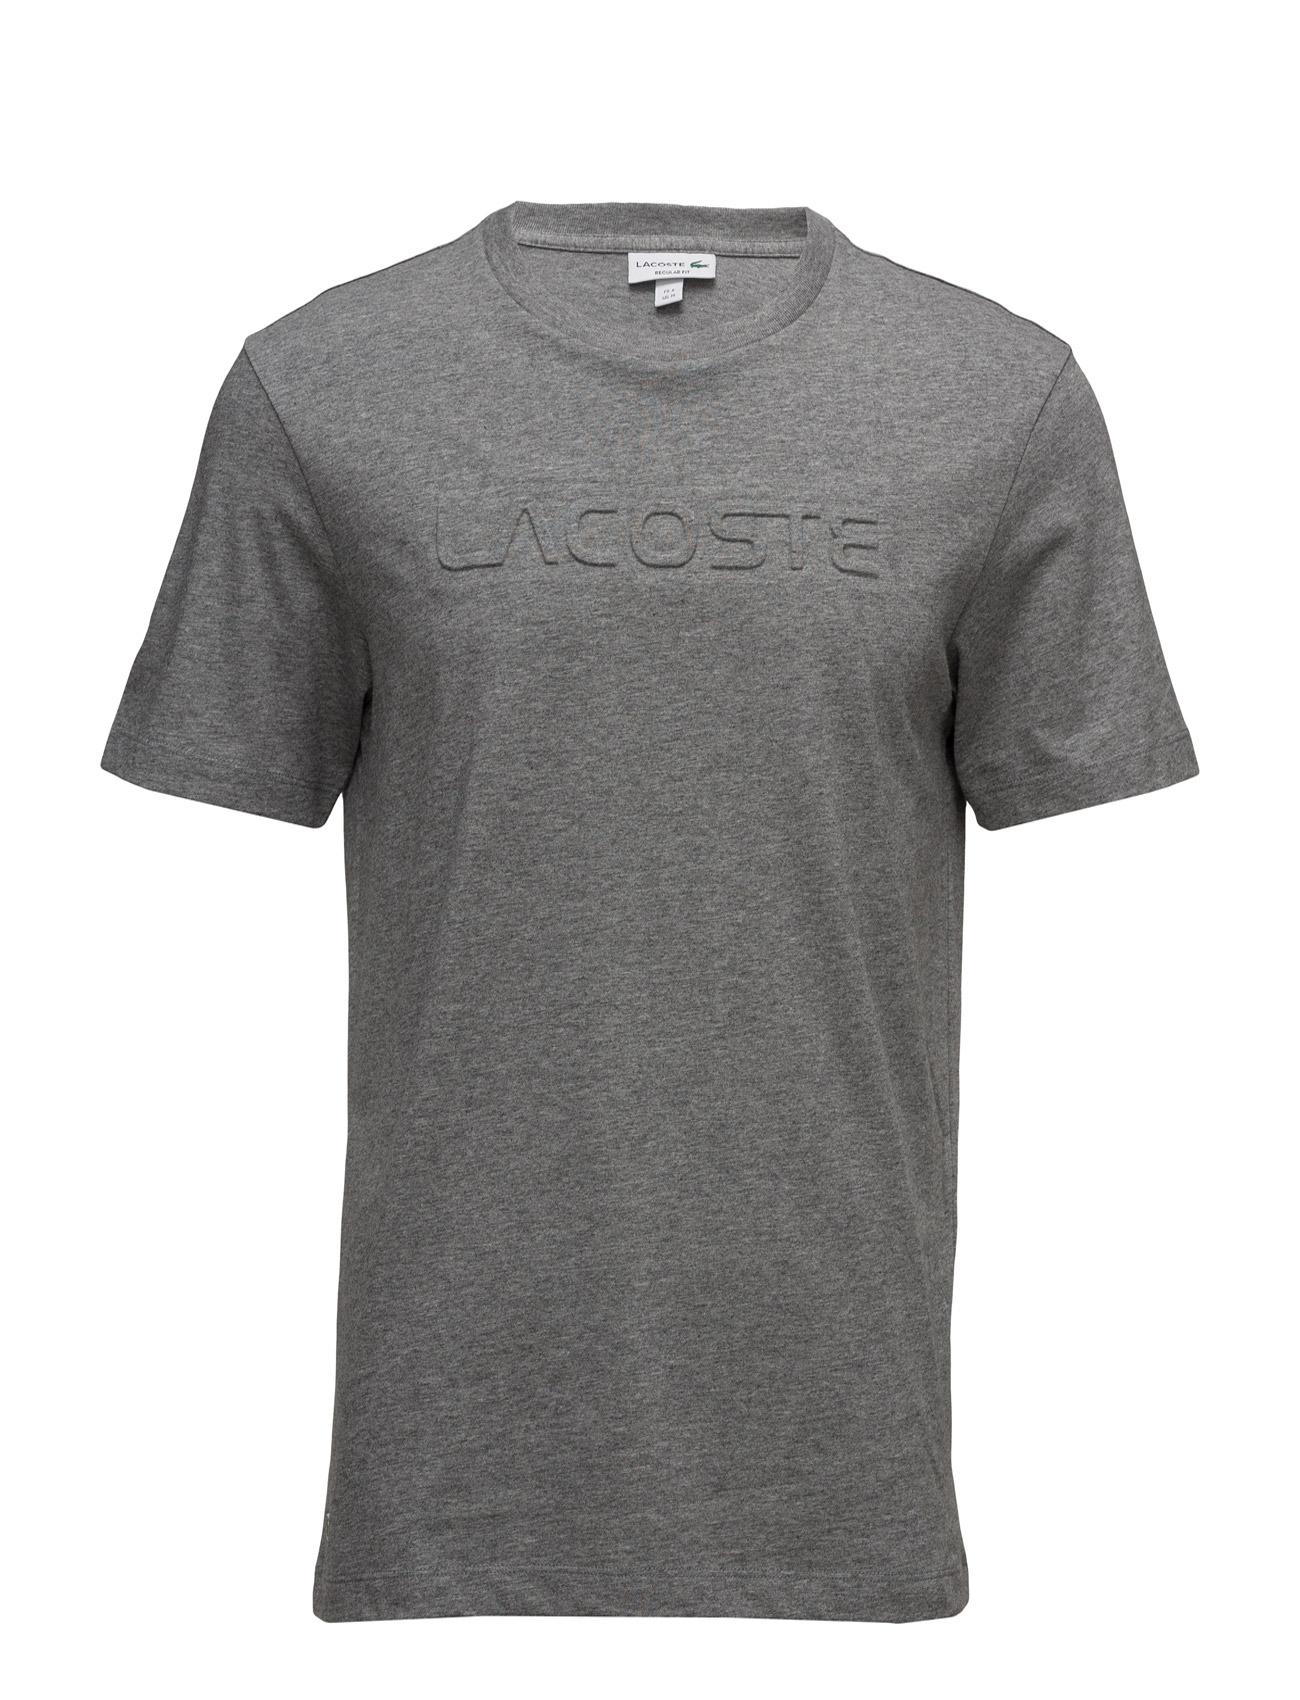 Tee-shirt&turtle neck fra lacoste fra boozt.com dk